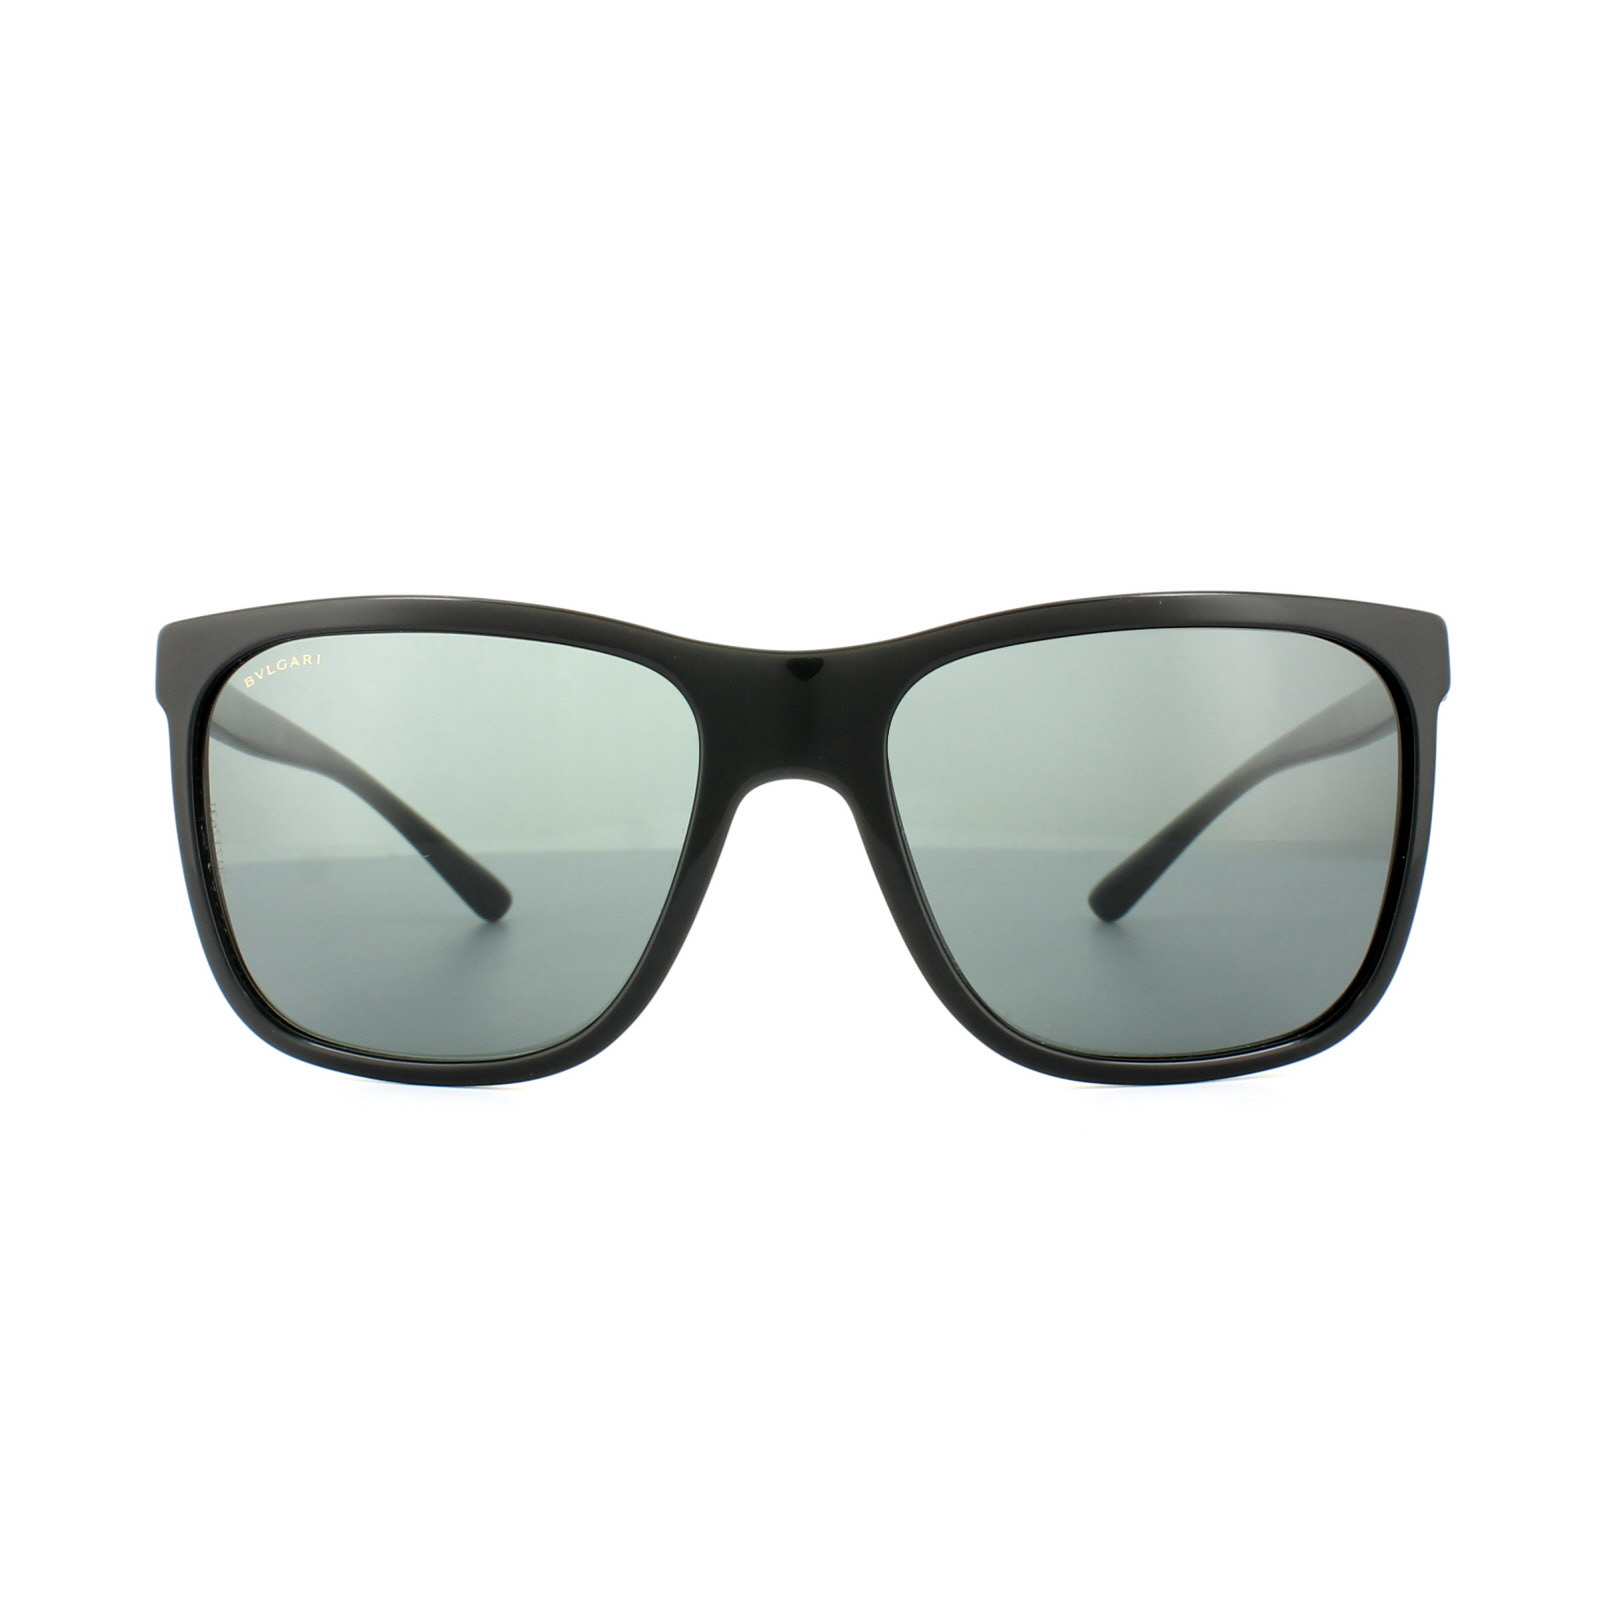 Cheap Bvlgari 7027 Sunglasses Discounted Sunglasses